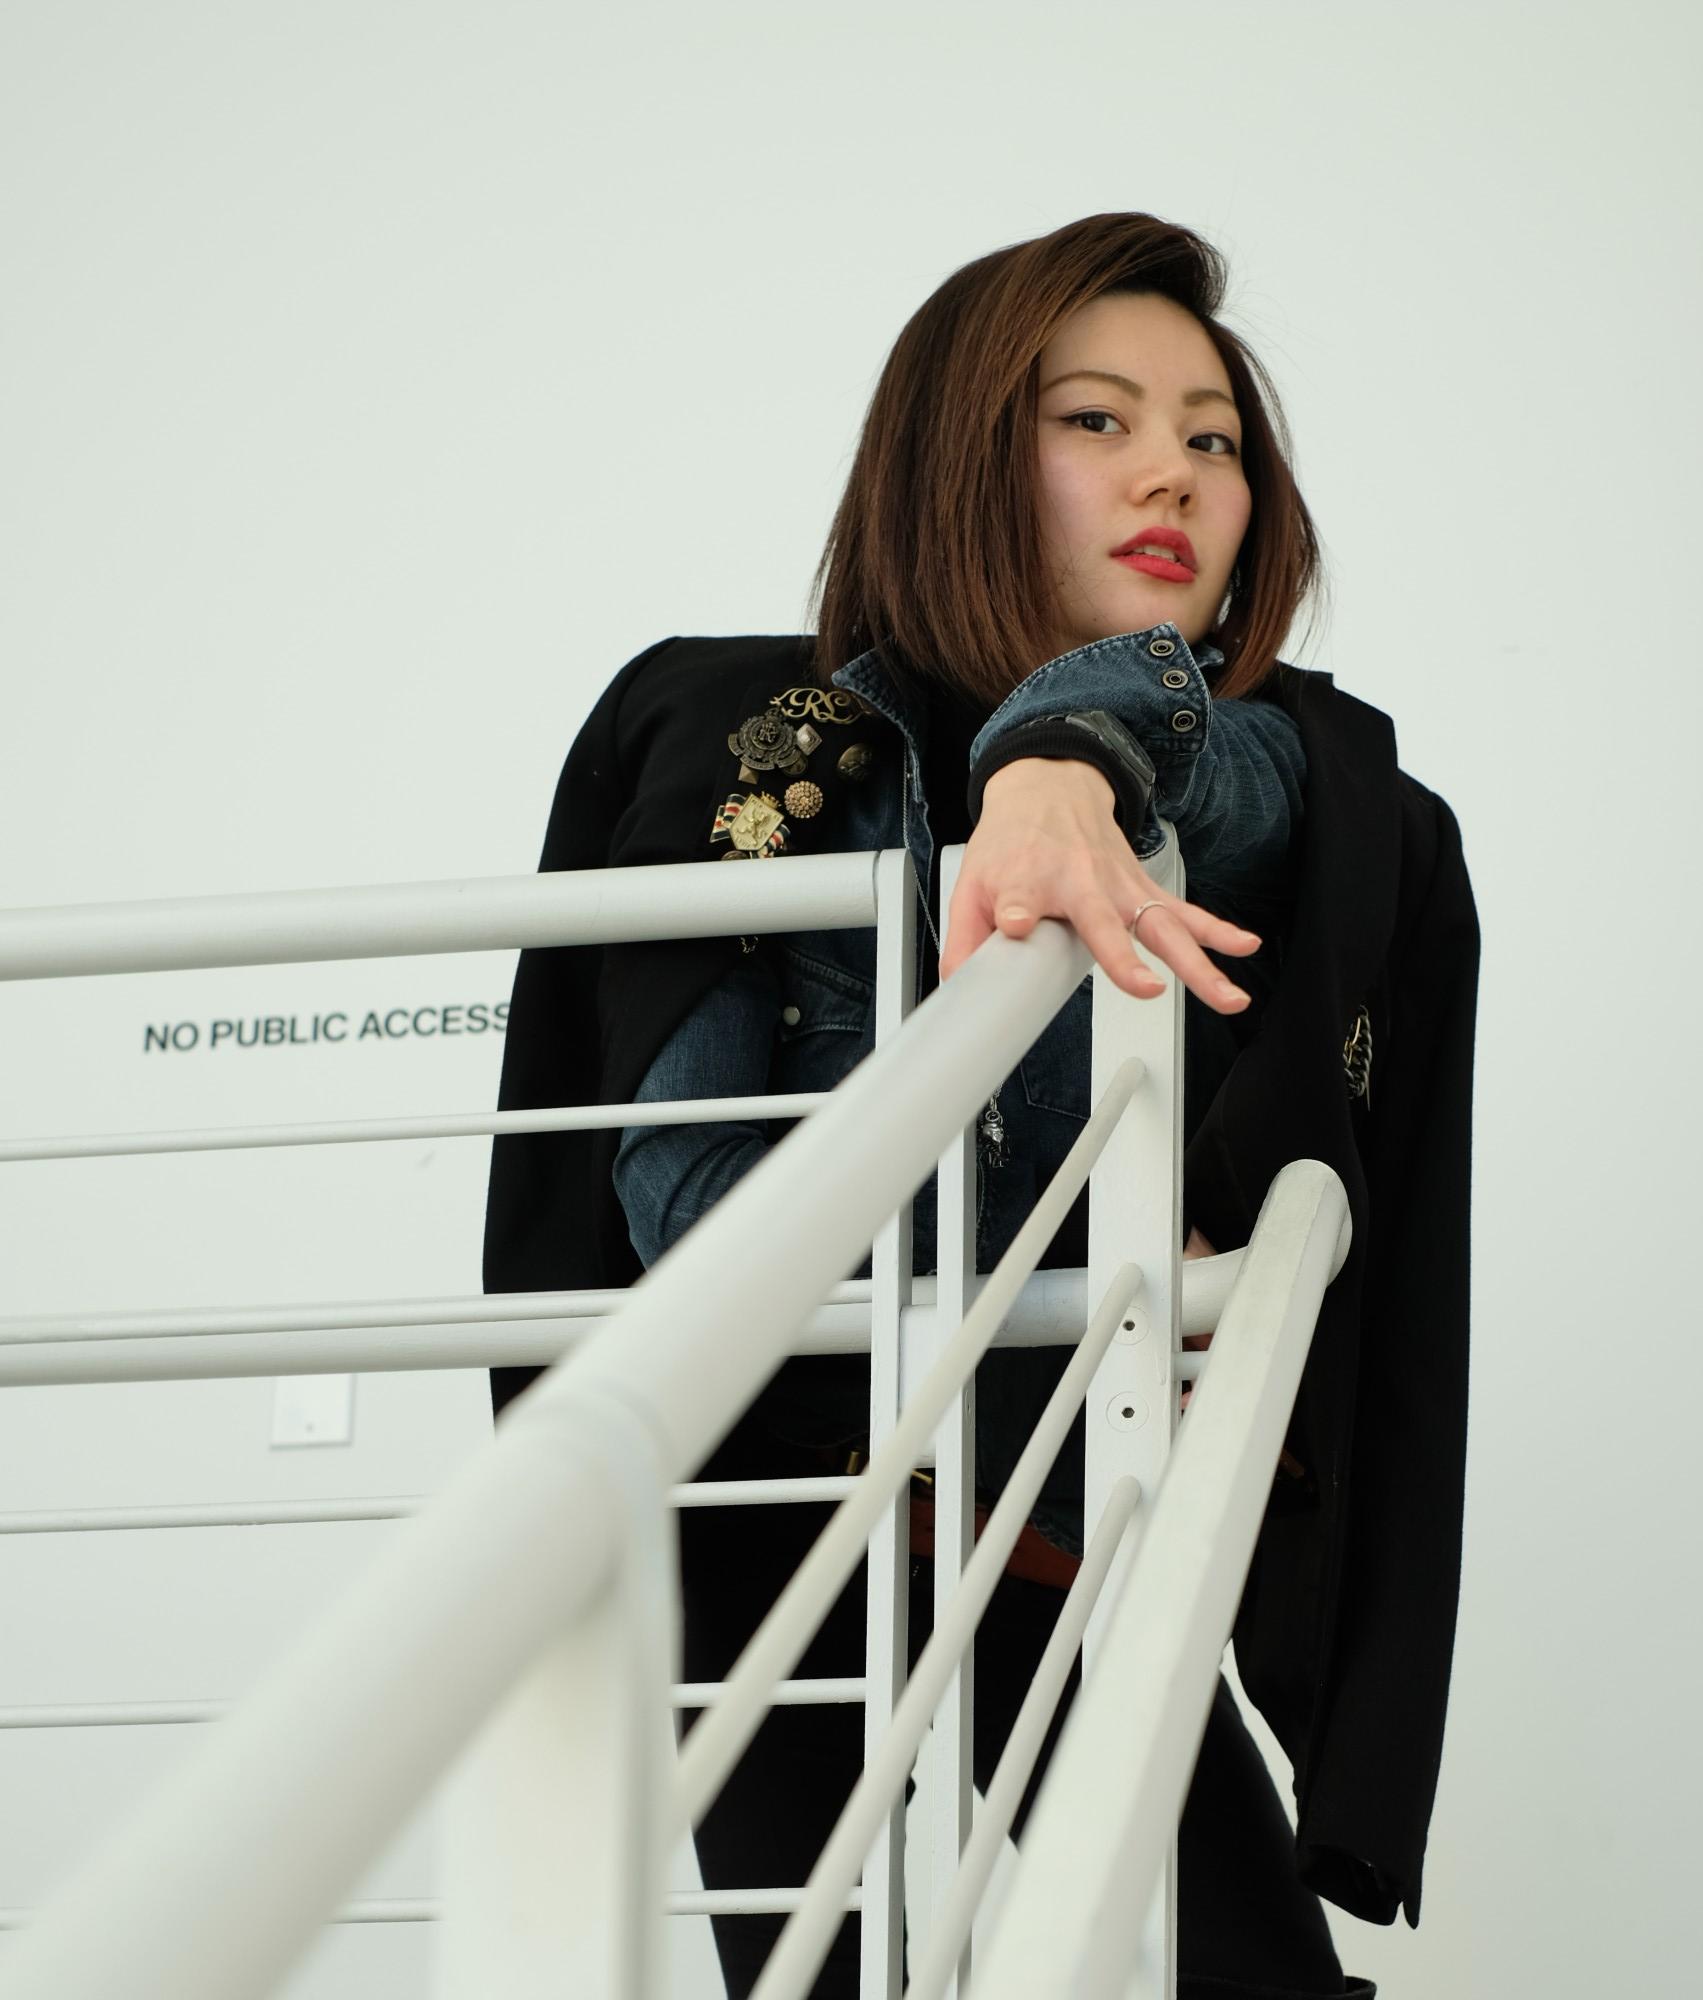 model on white staircase